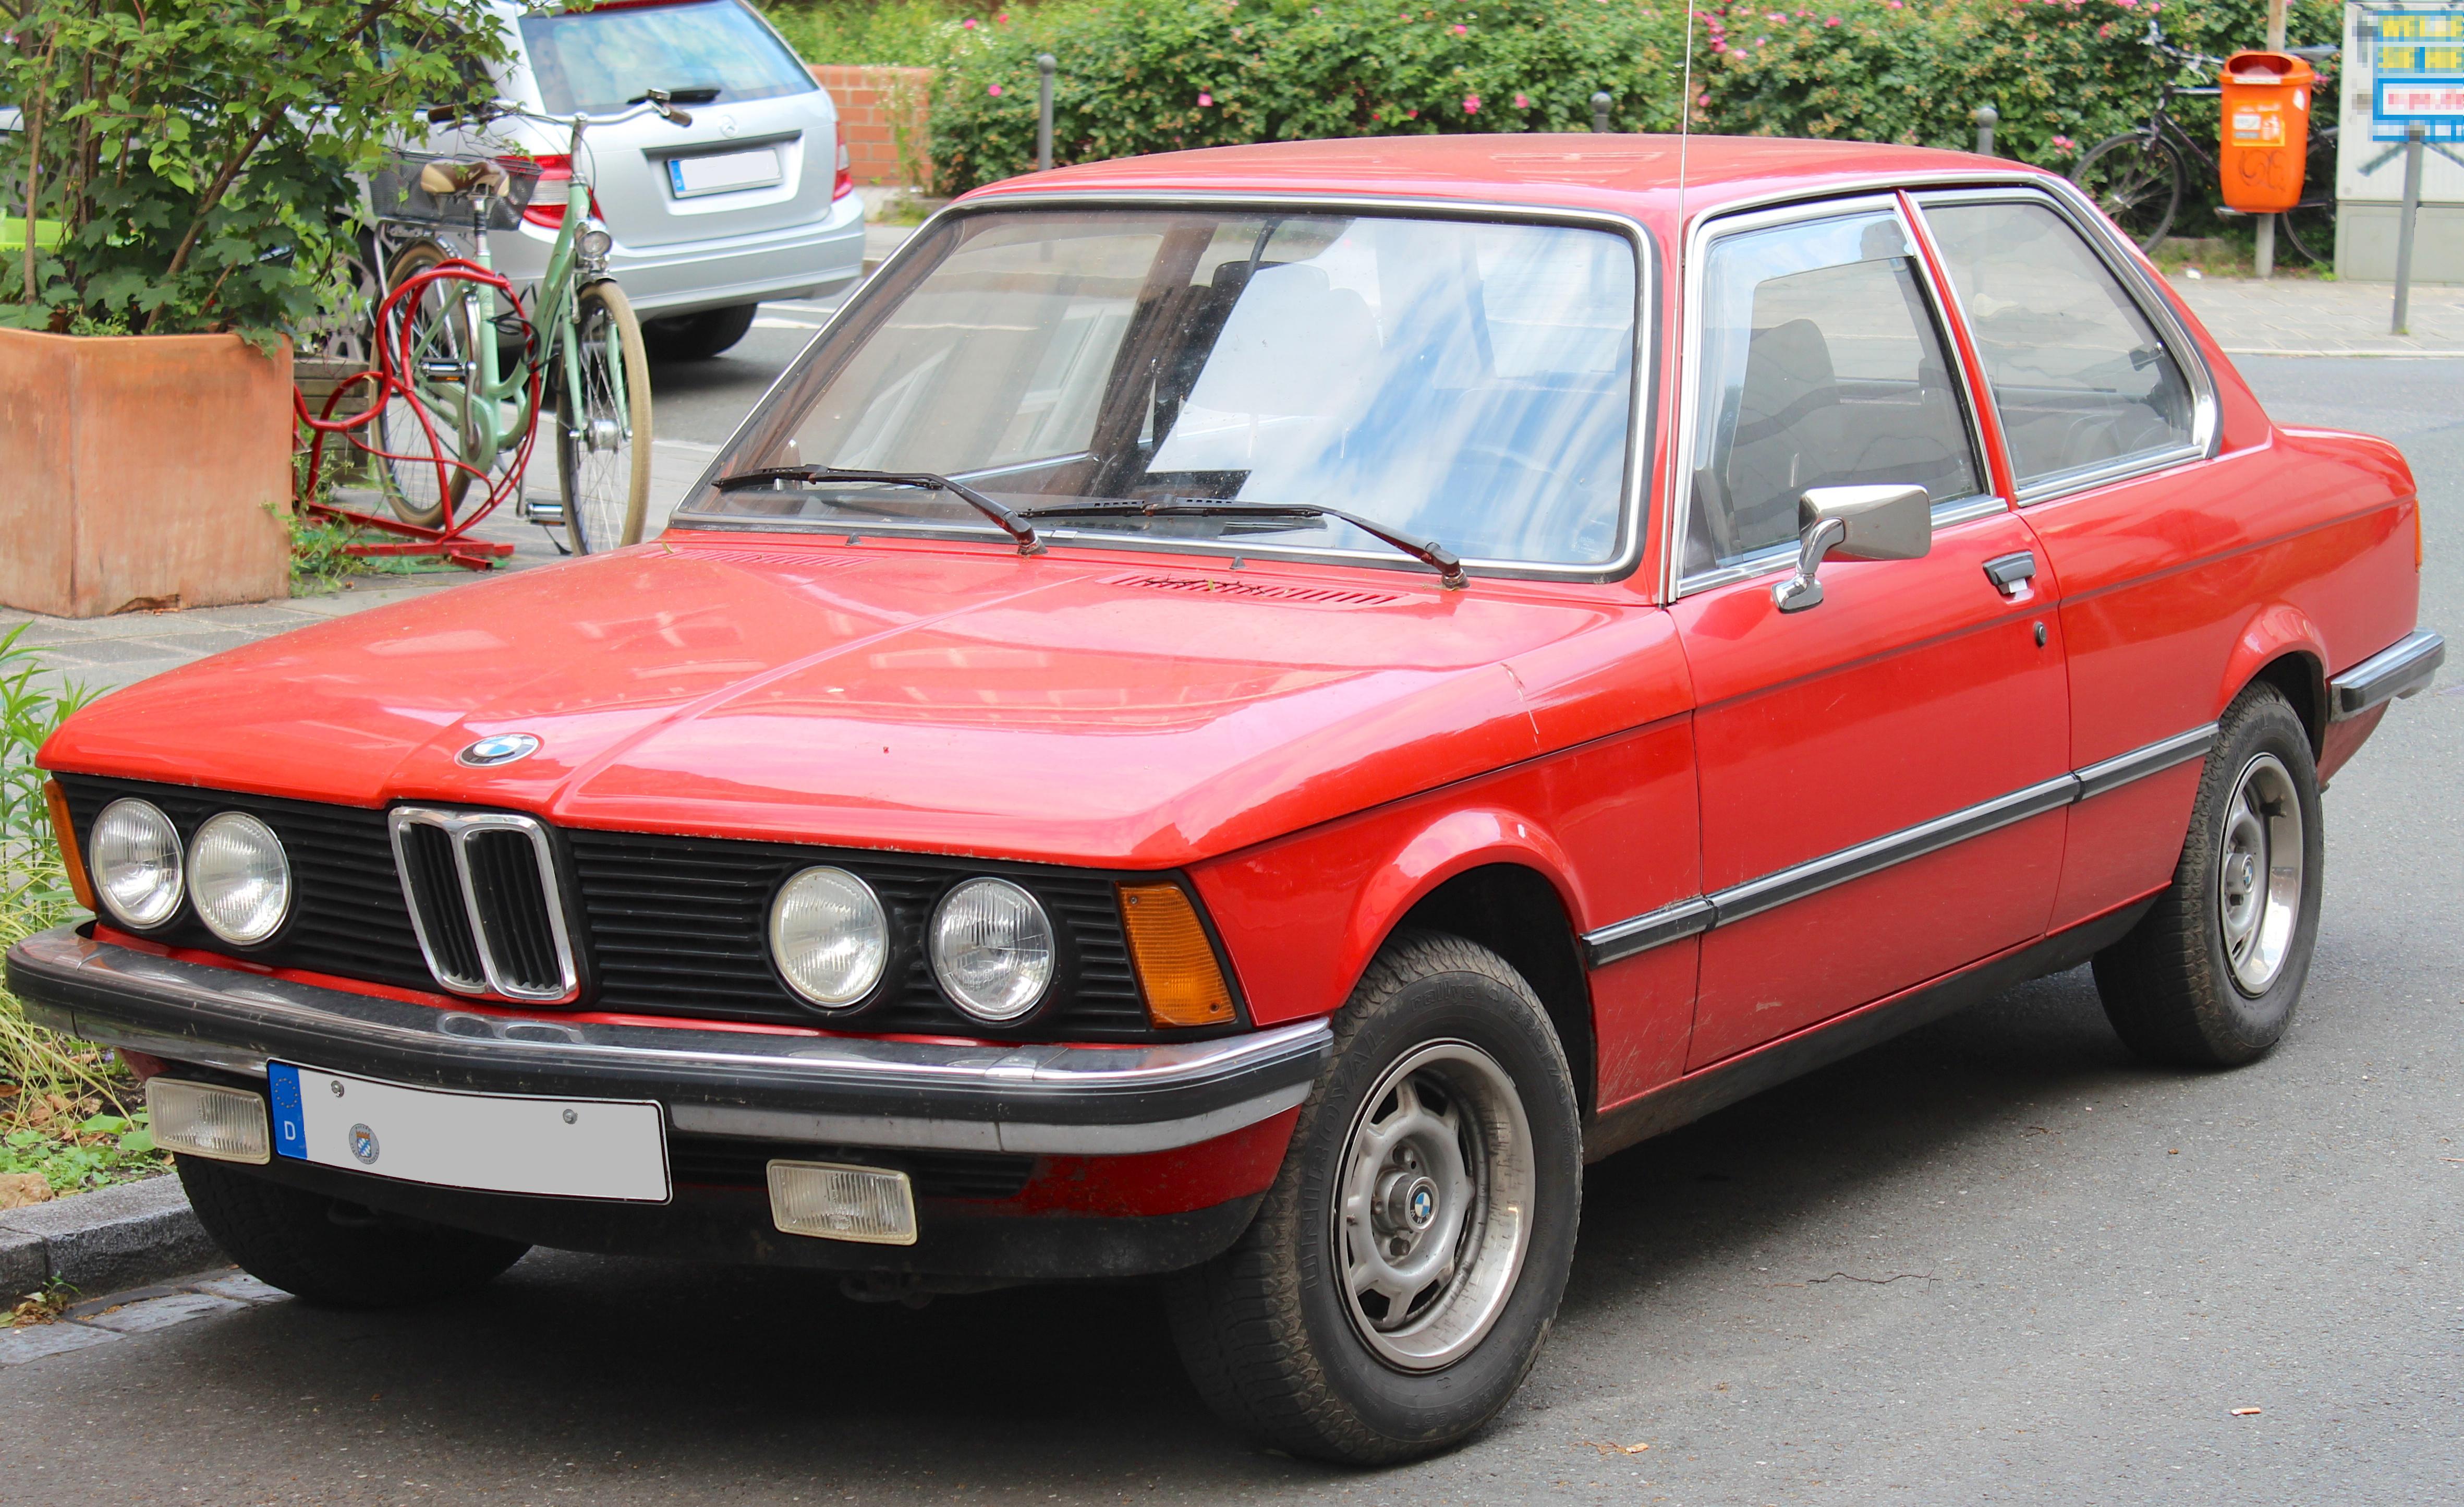 File:BMW E21 (3er).jpg - Wikimedia Commons